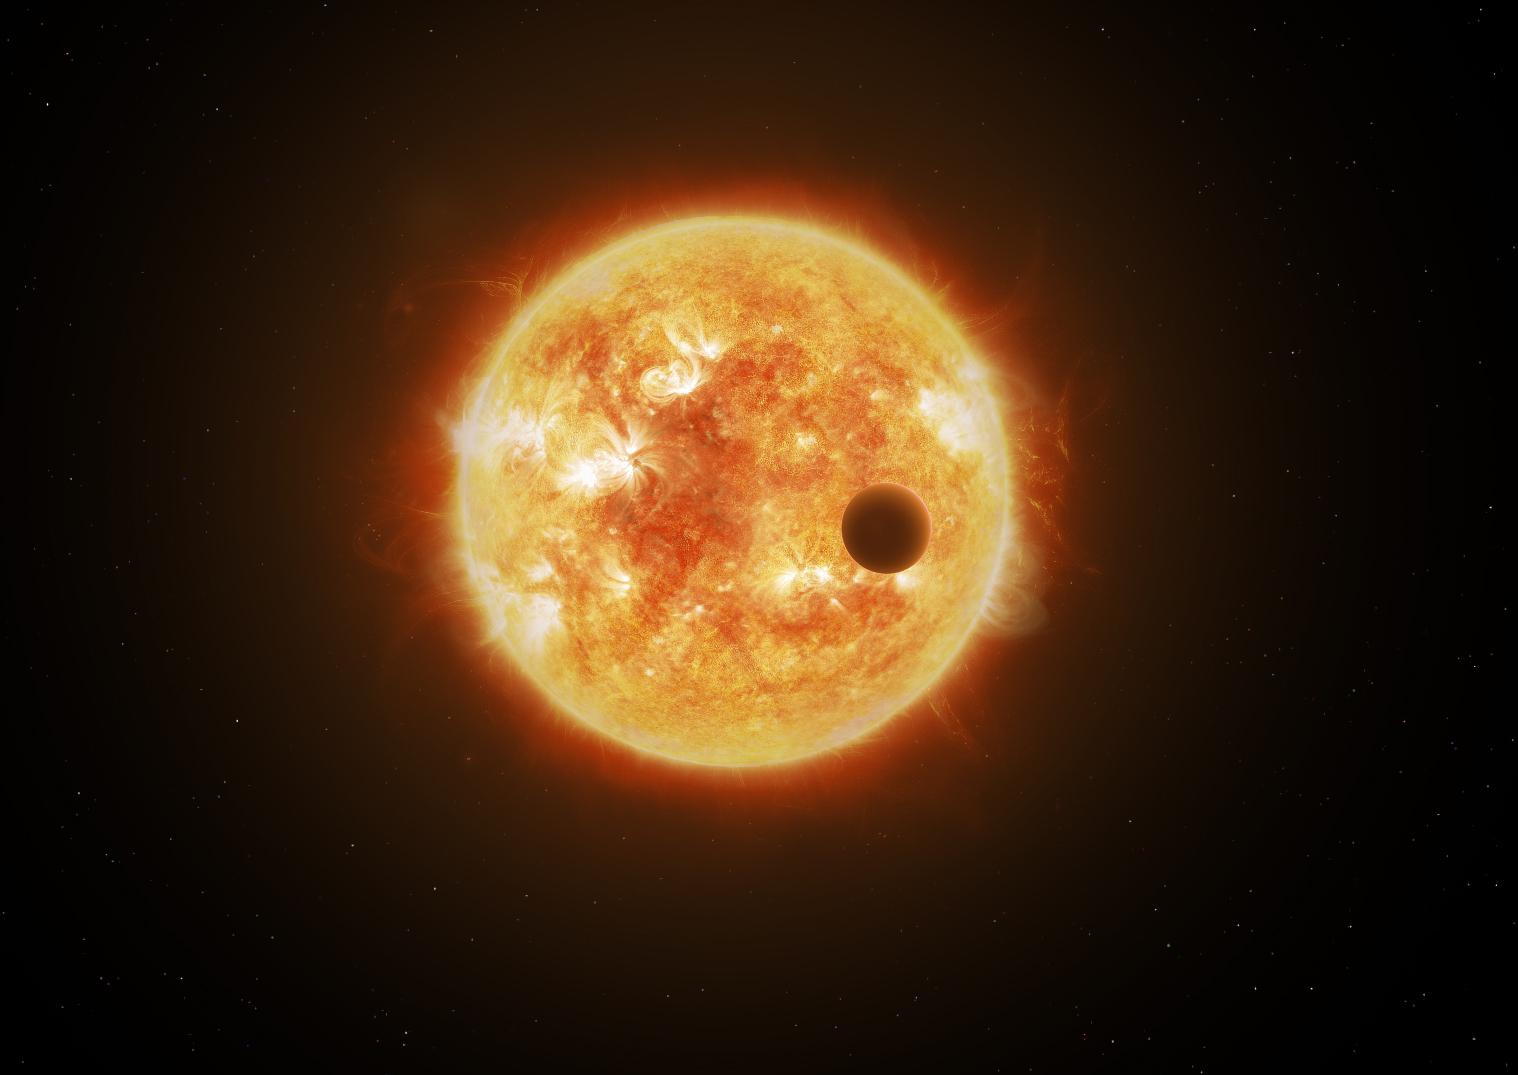 1567216670208-Exoplanet_occlusion_artist_impression.jpg